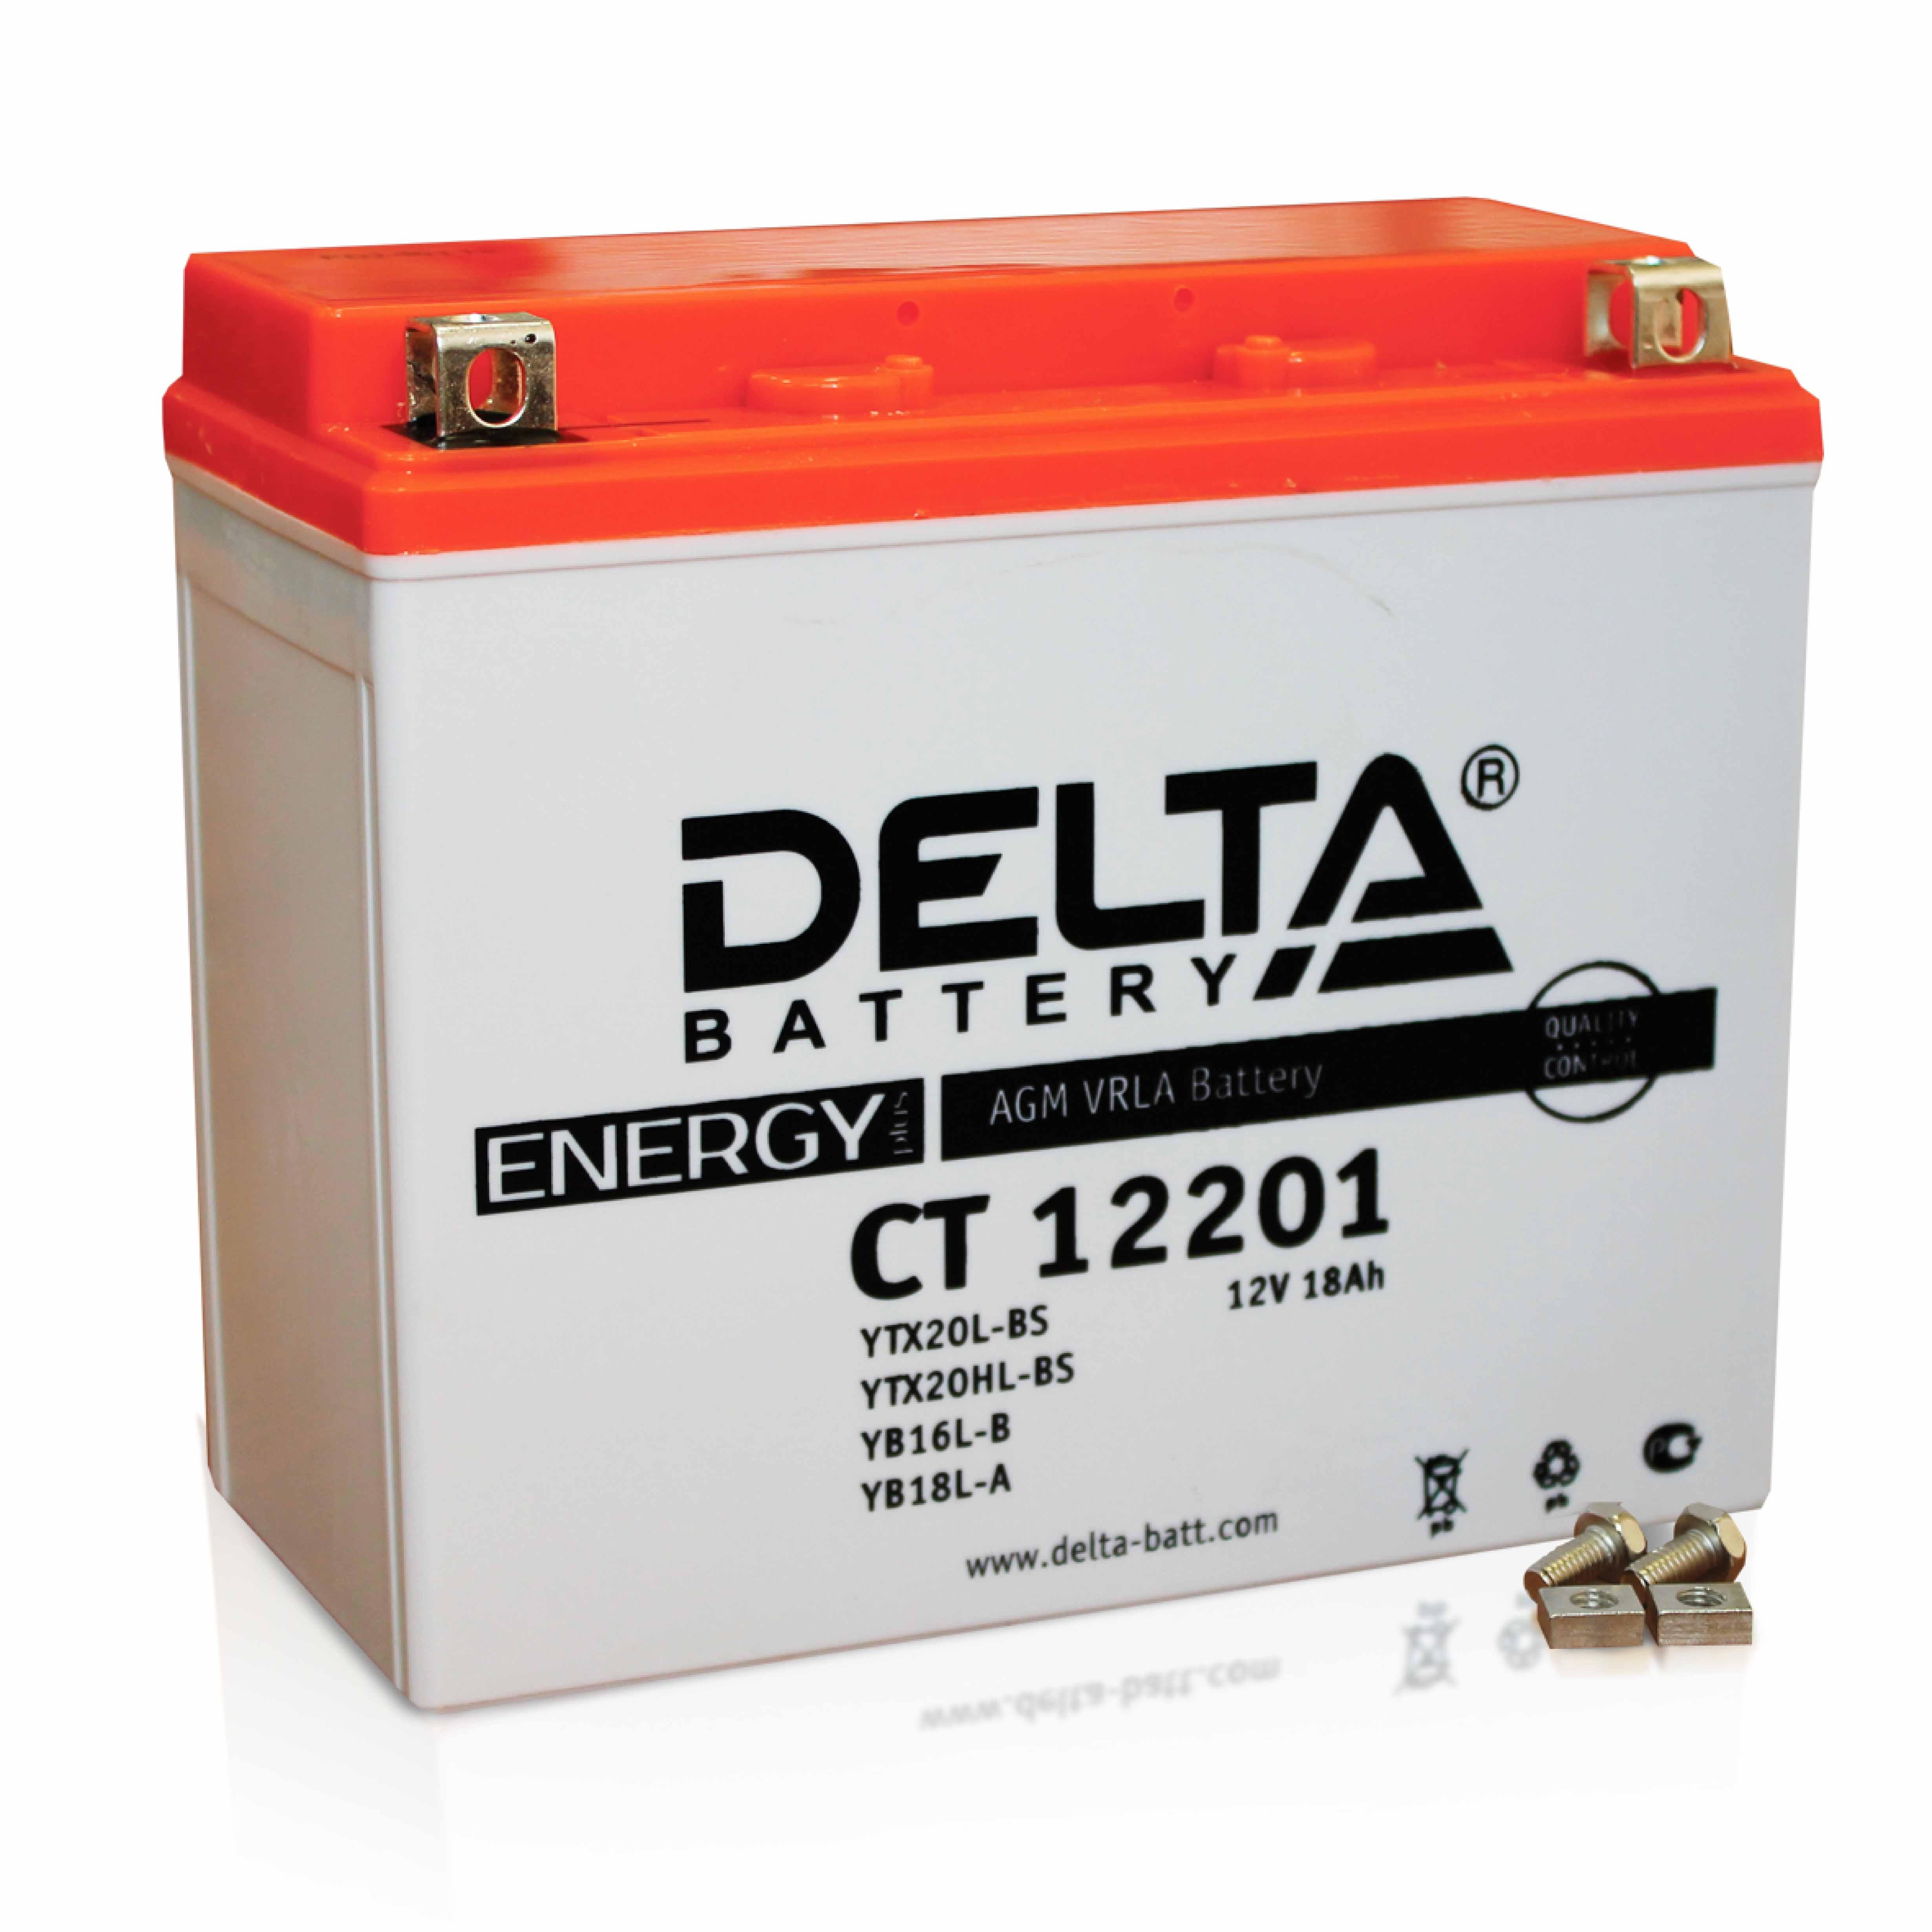 Аккумулятор Delta Battery CT12201, арт. CT12201